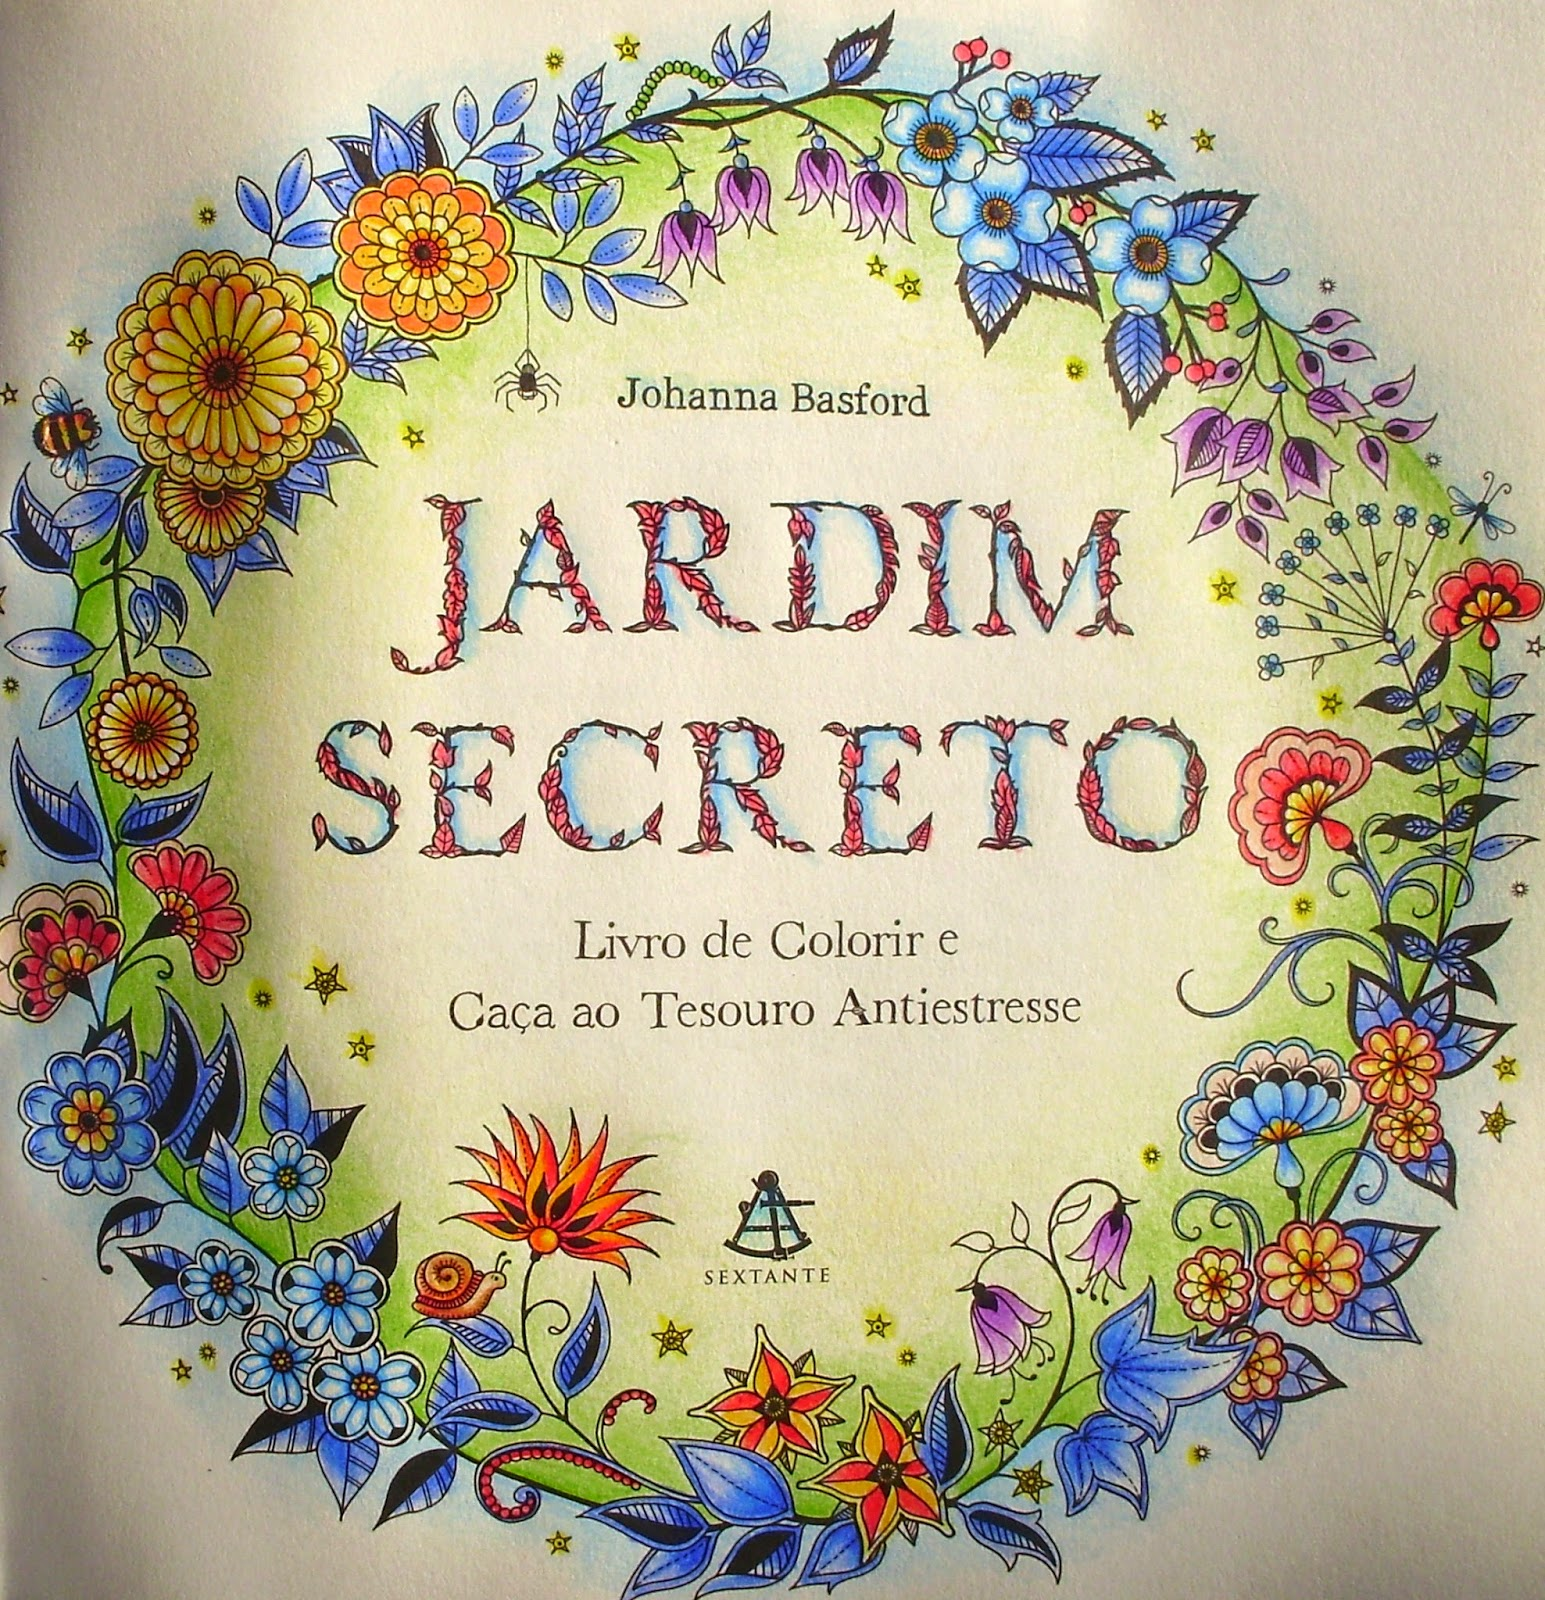 BLOG DA BETH Usando chalk no Livro Jardim Secreto